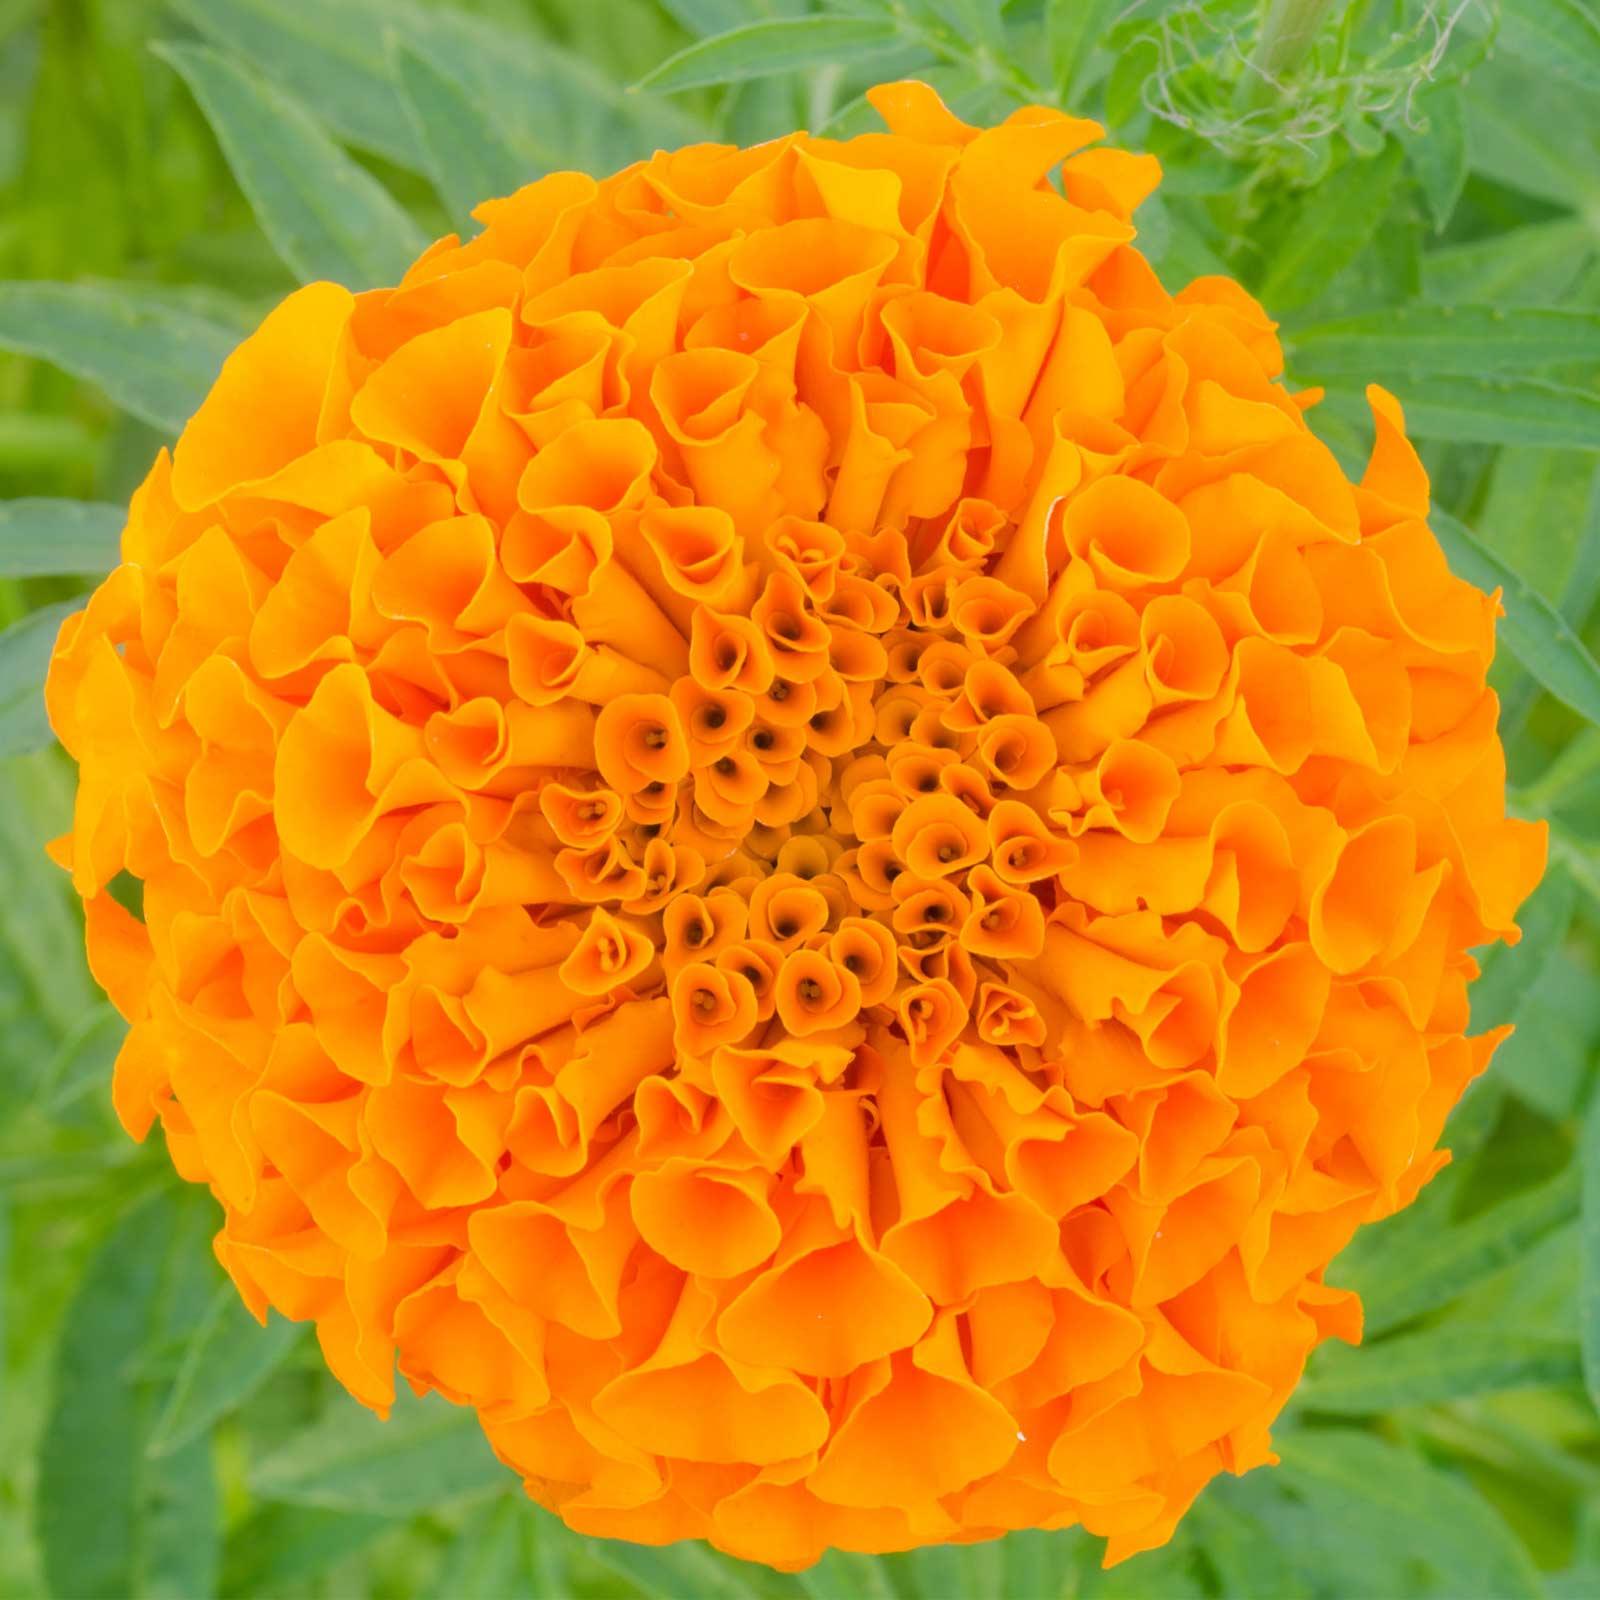 African Marigold Flower Garden Seeds Lady Series F1 Orange 1000 Seed